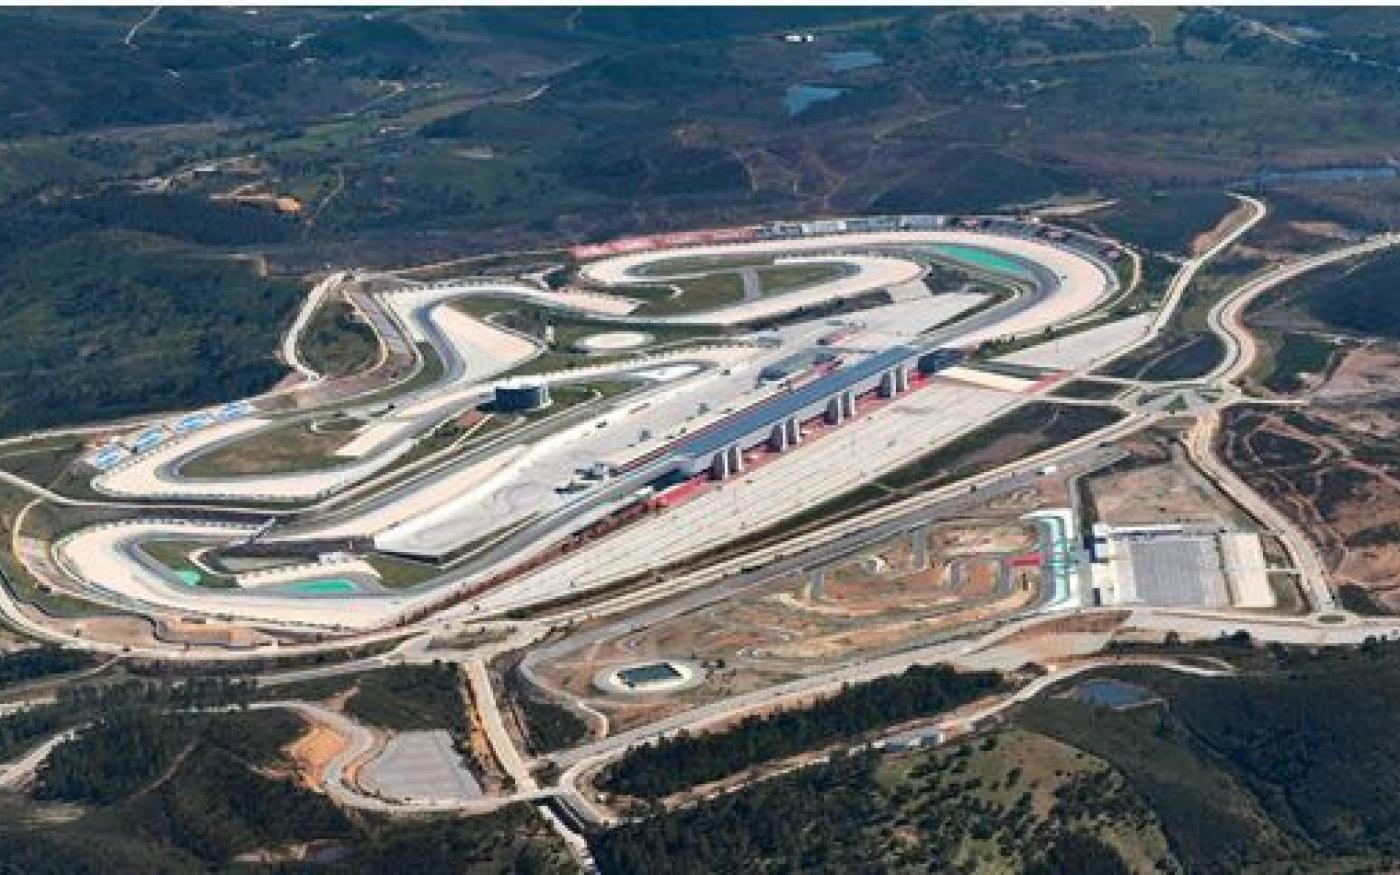 Algarve toegevoegd aan kalender MotoGP World Championship